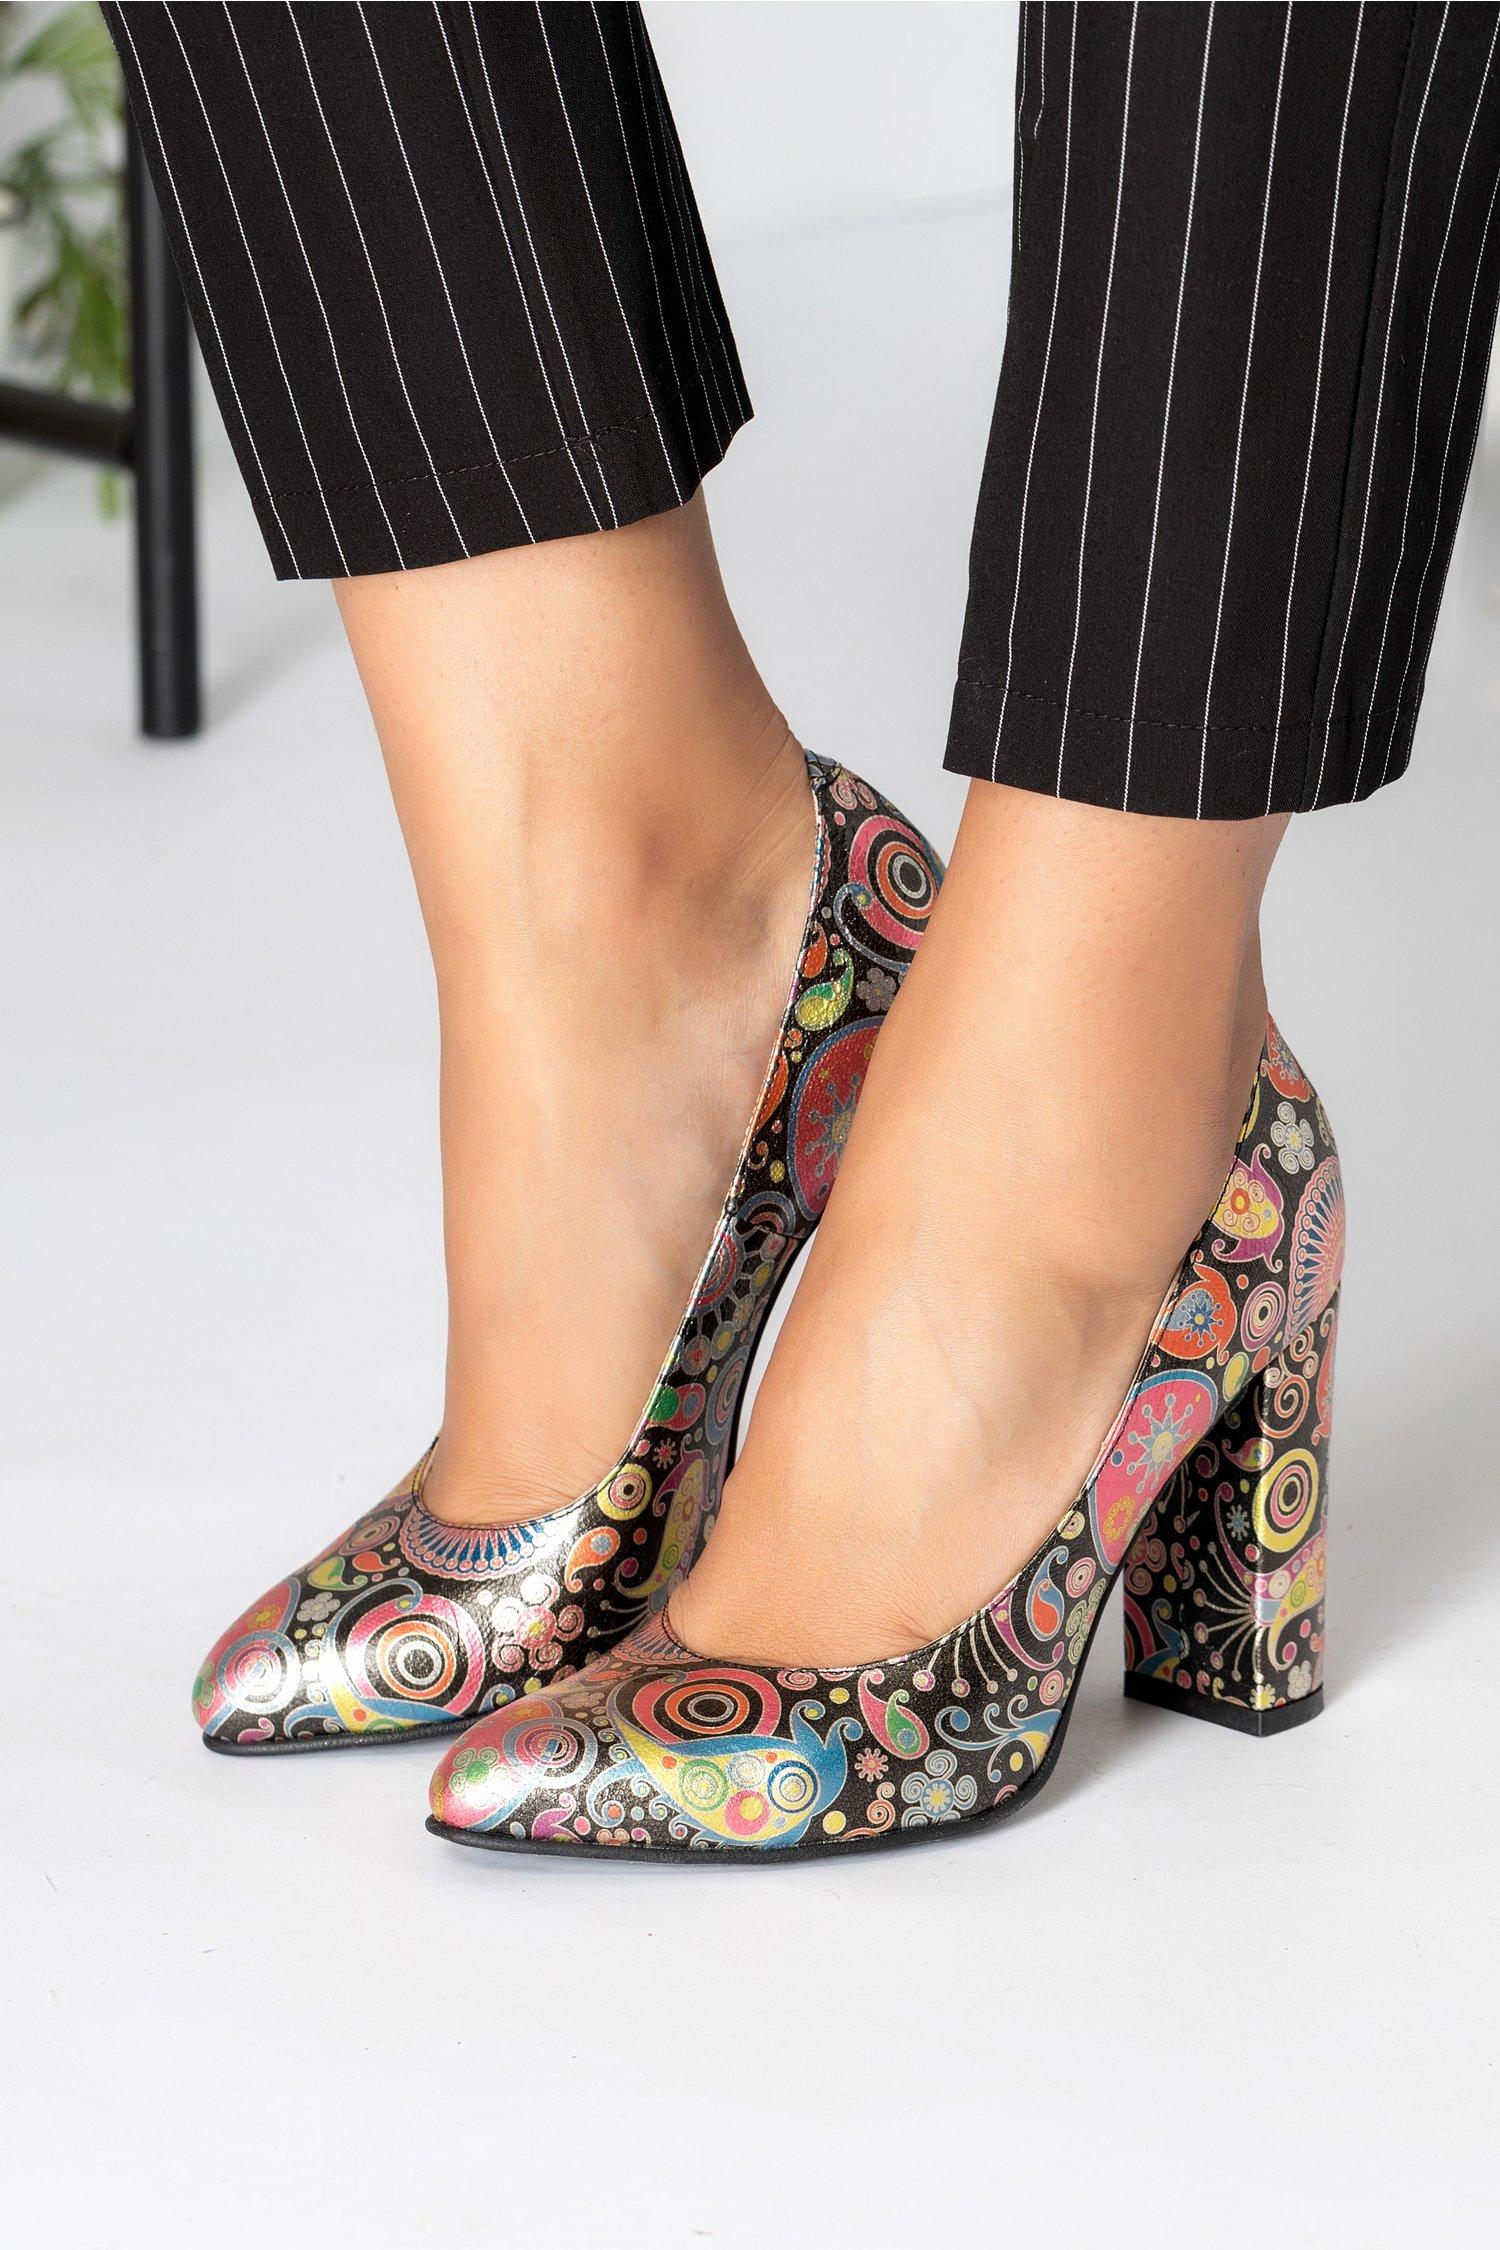 Pantofi dama negri cu imprimeuri abstracte colorate imagine